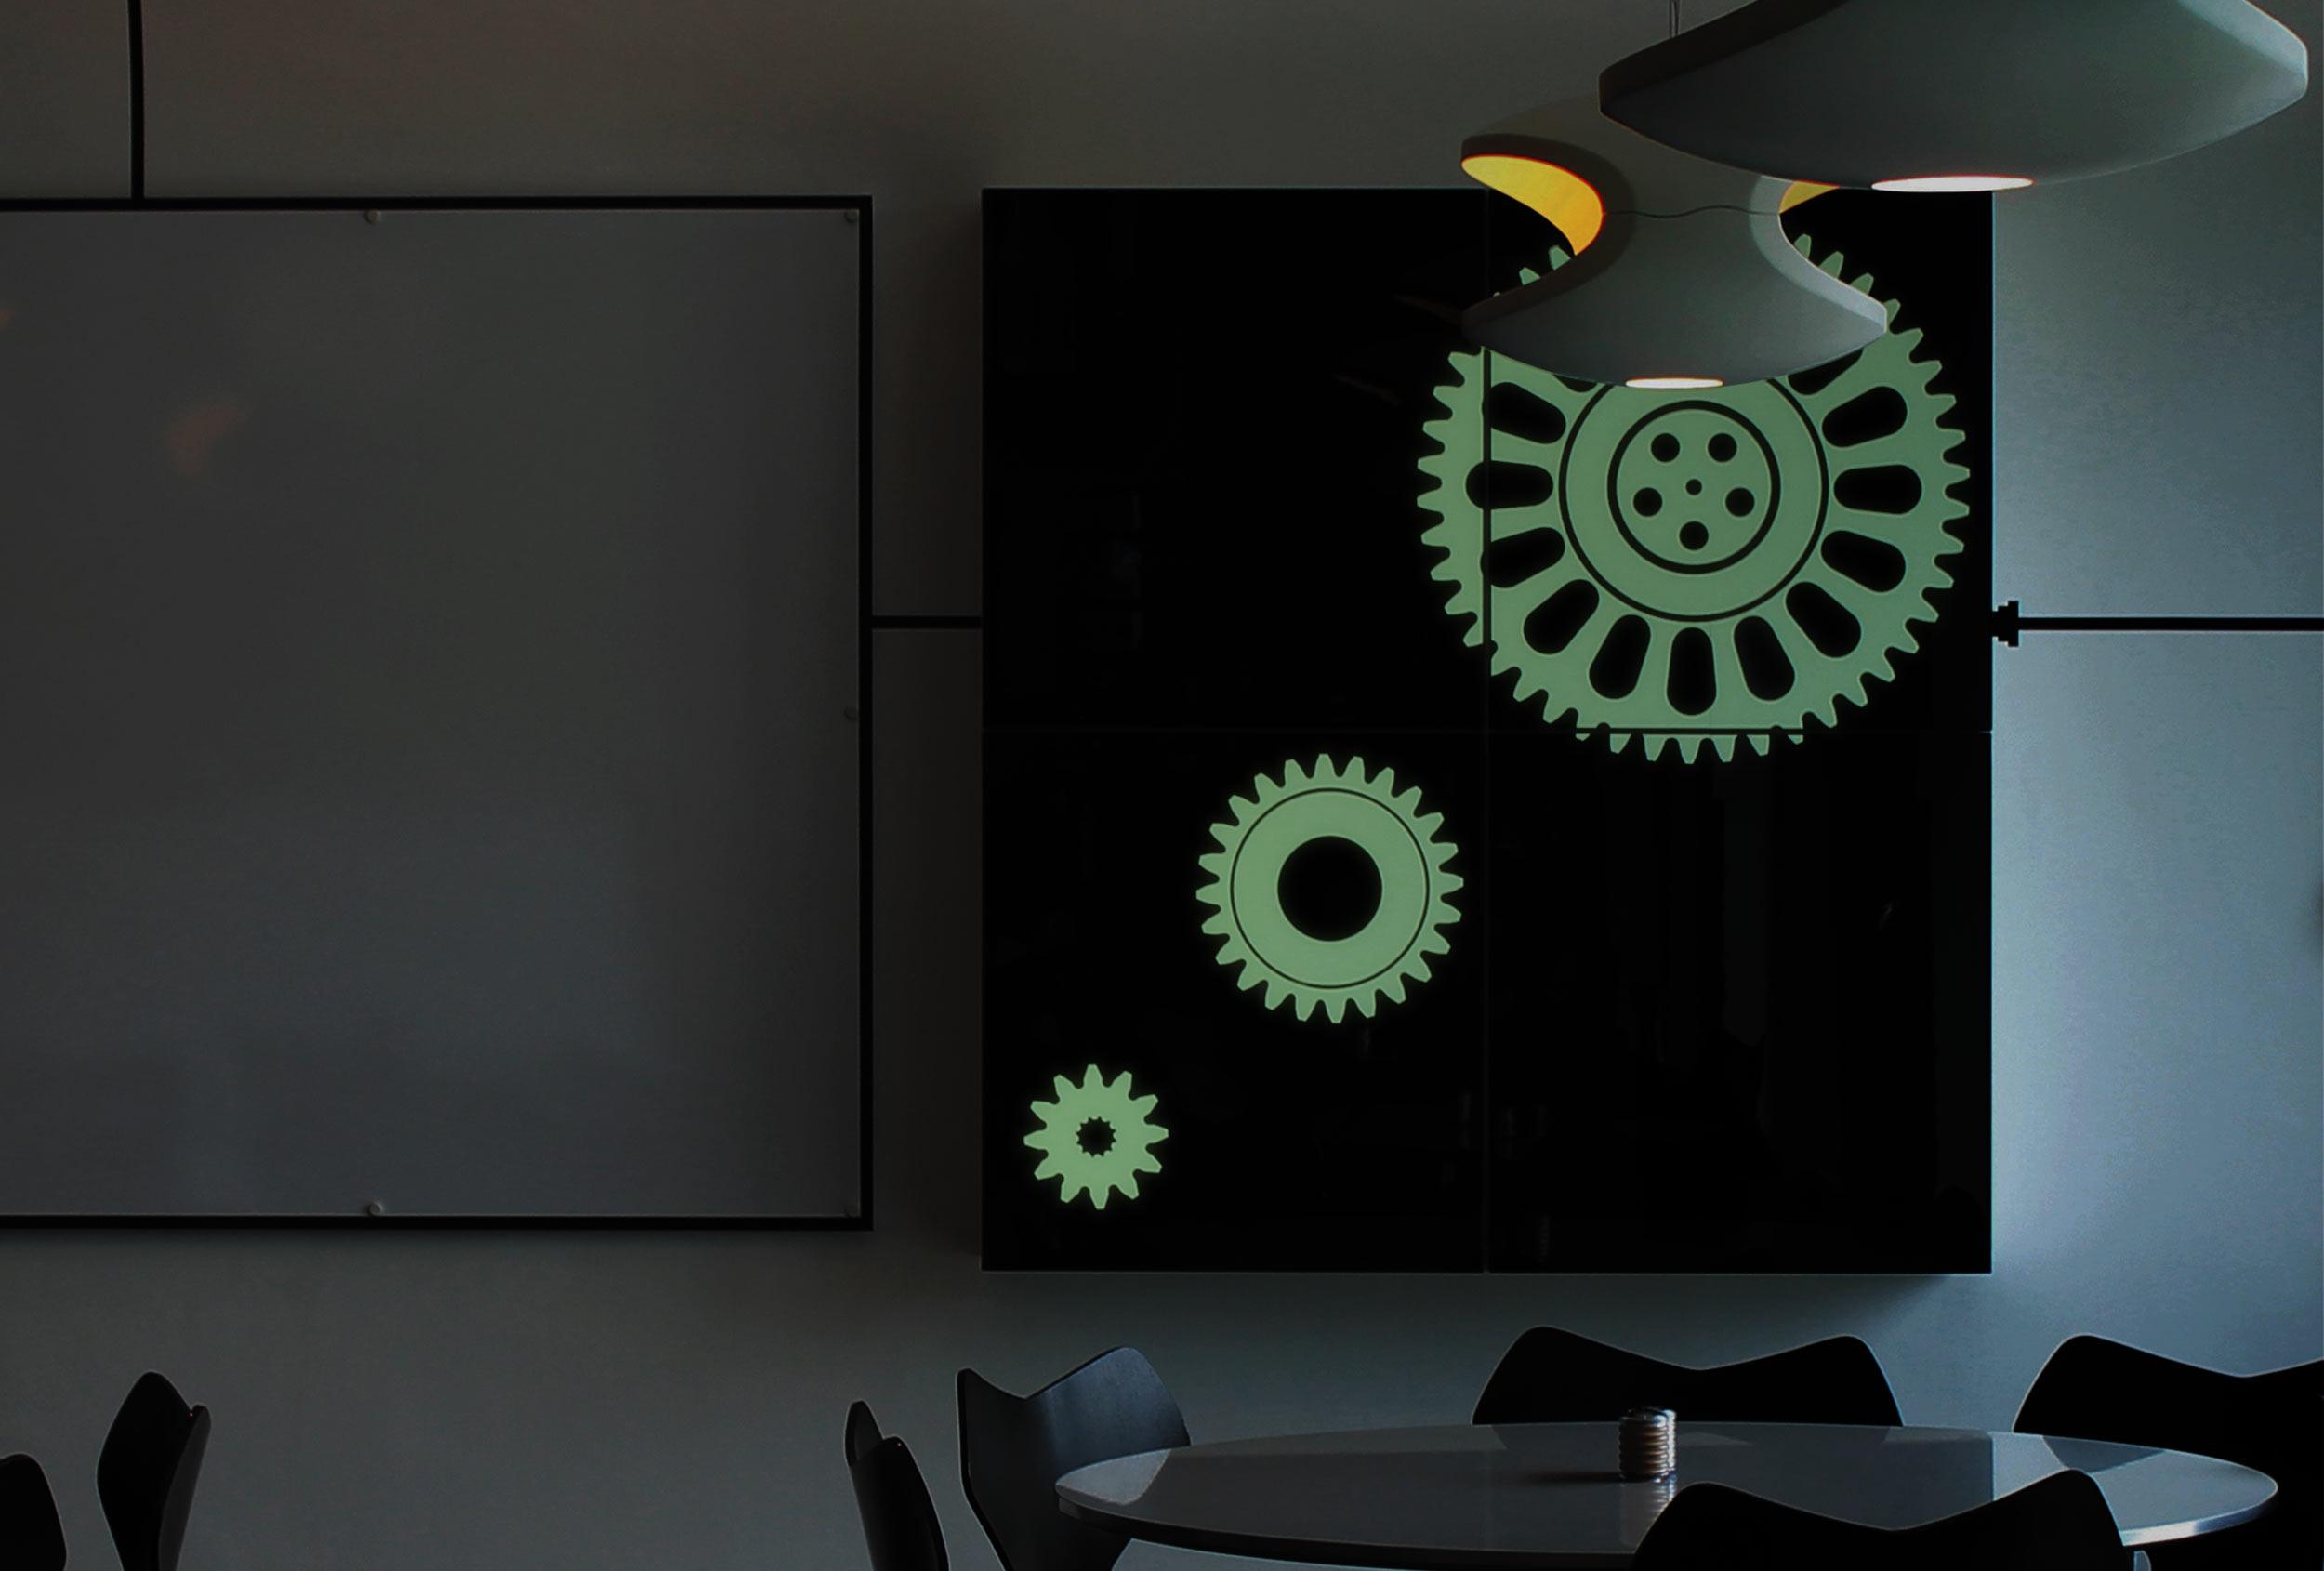 Innovative thinking - glow in the dark gears.